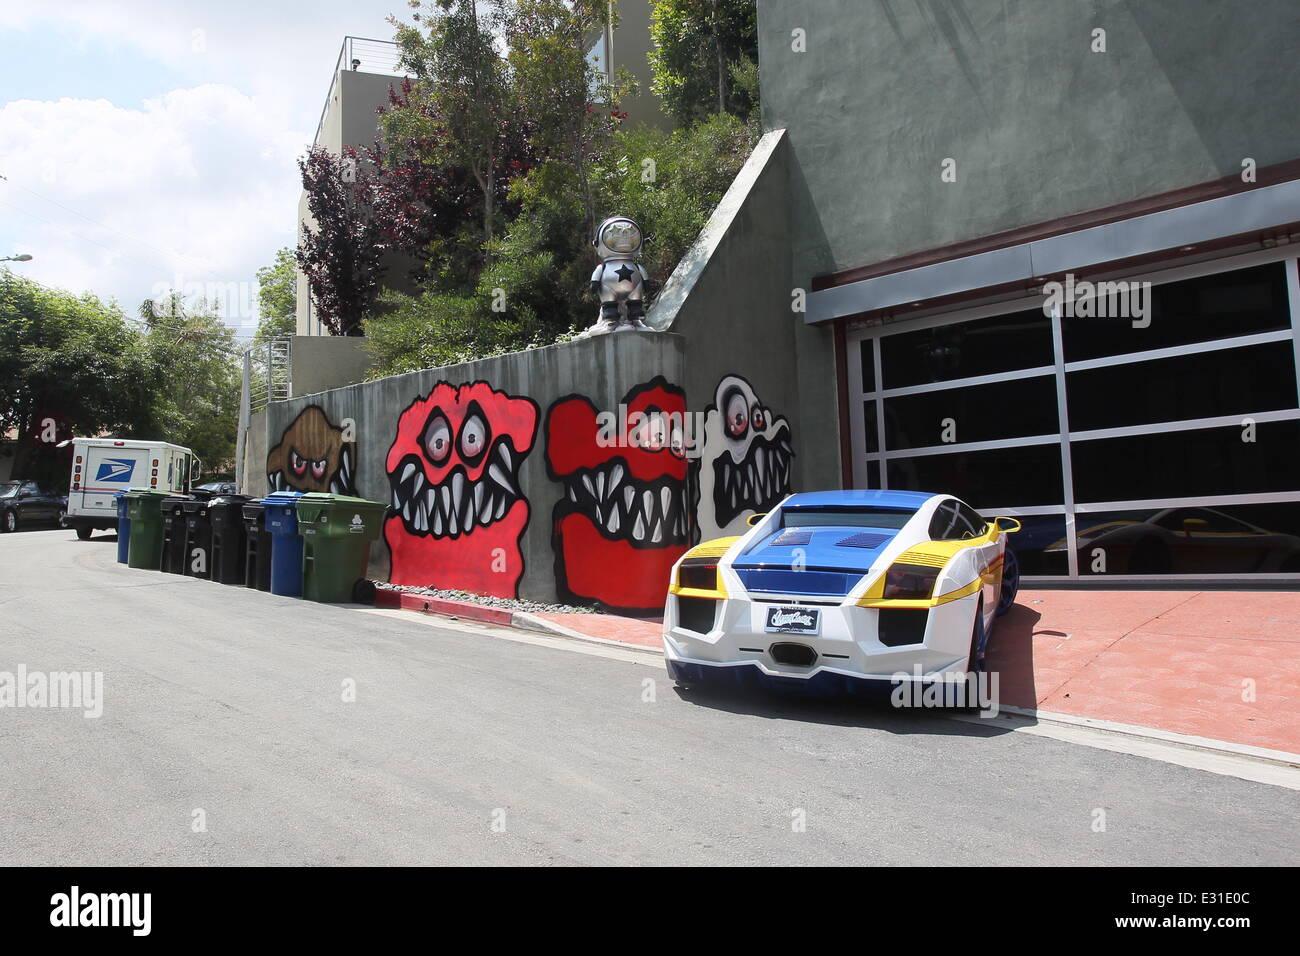 Chris Brown Graffiti Stock Photos & Chris Brown Graffiti